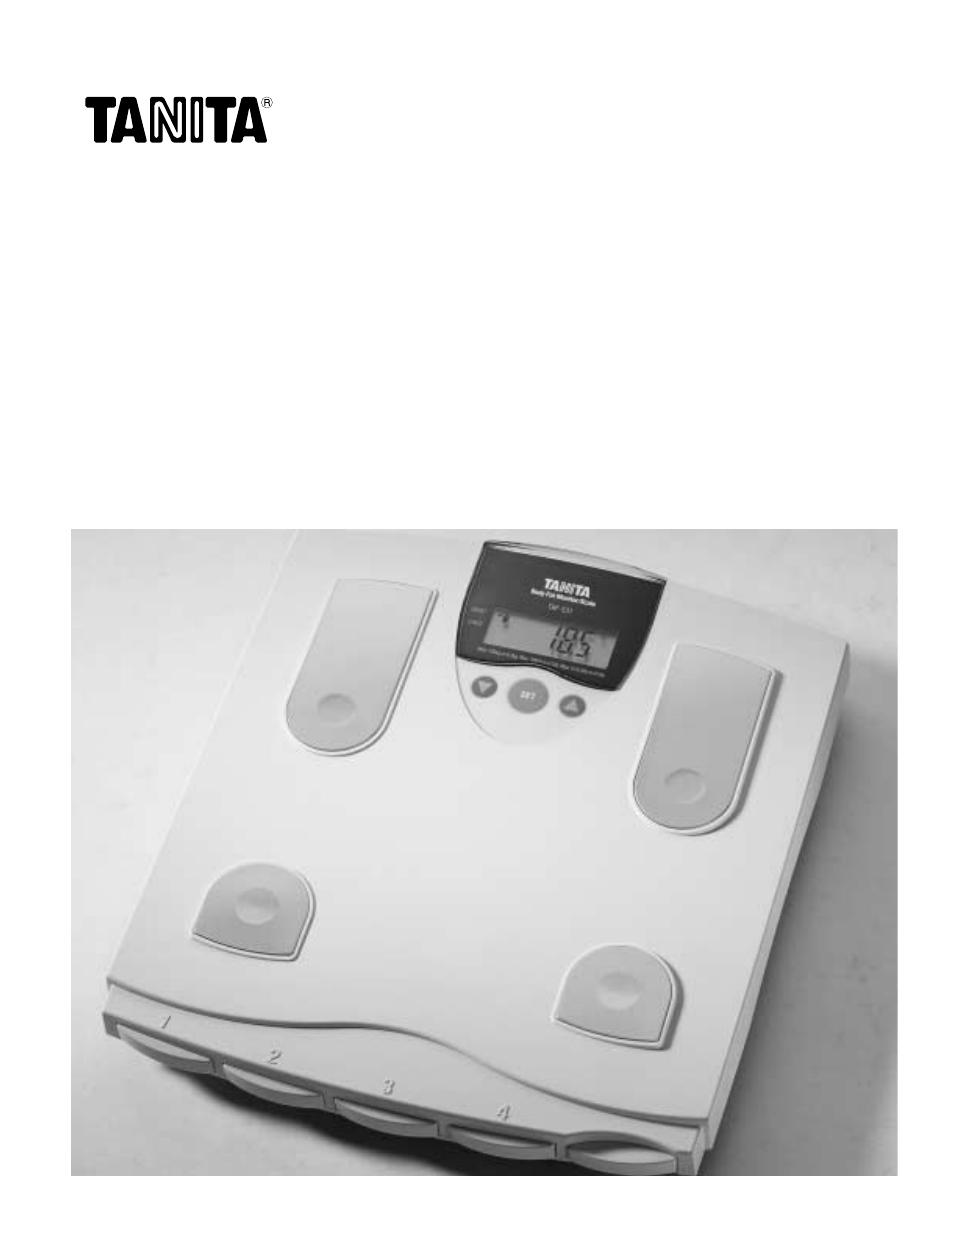 tanita tbf 531 user manual 13 pages rh manualsdir com